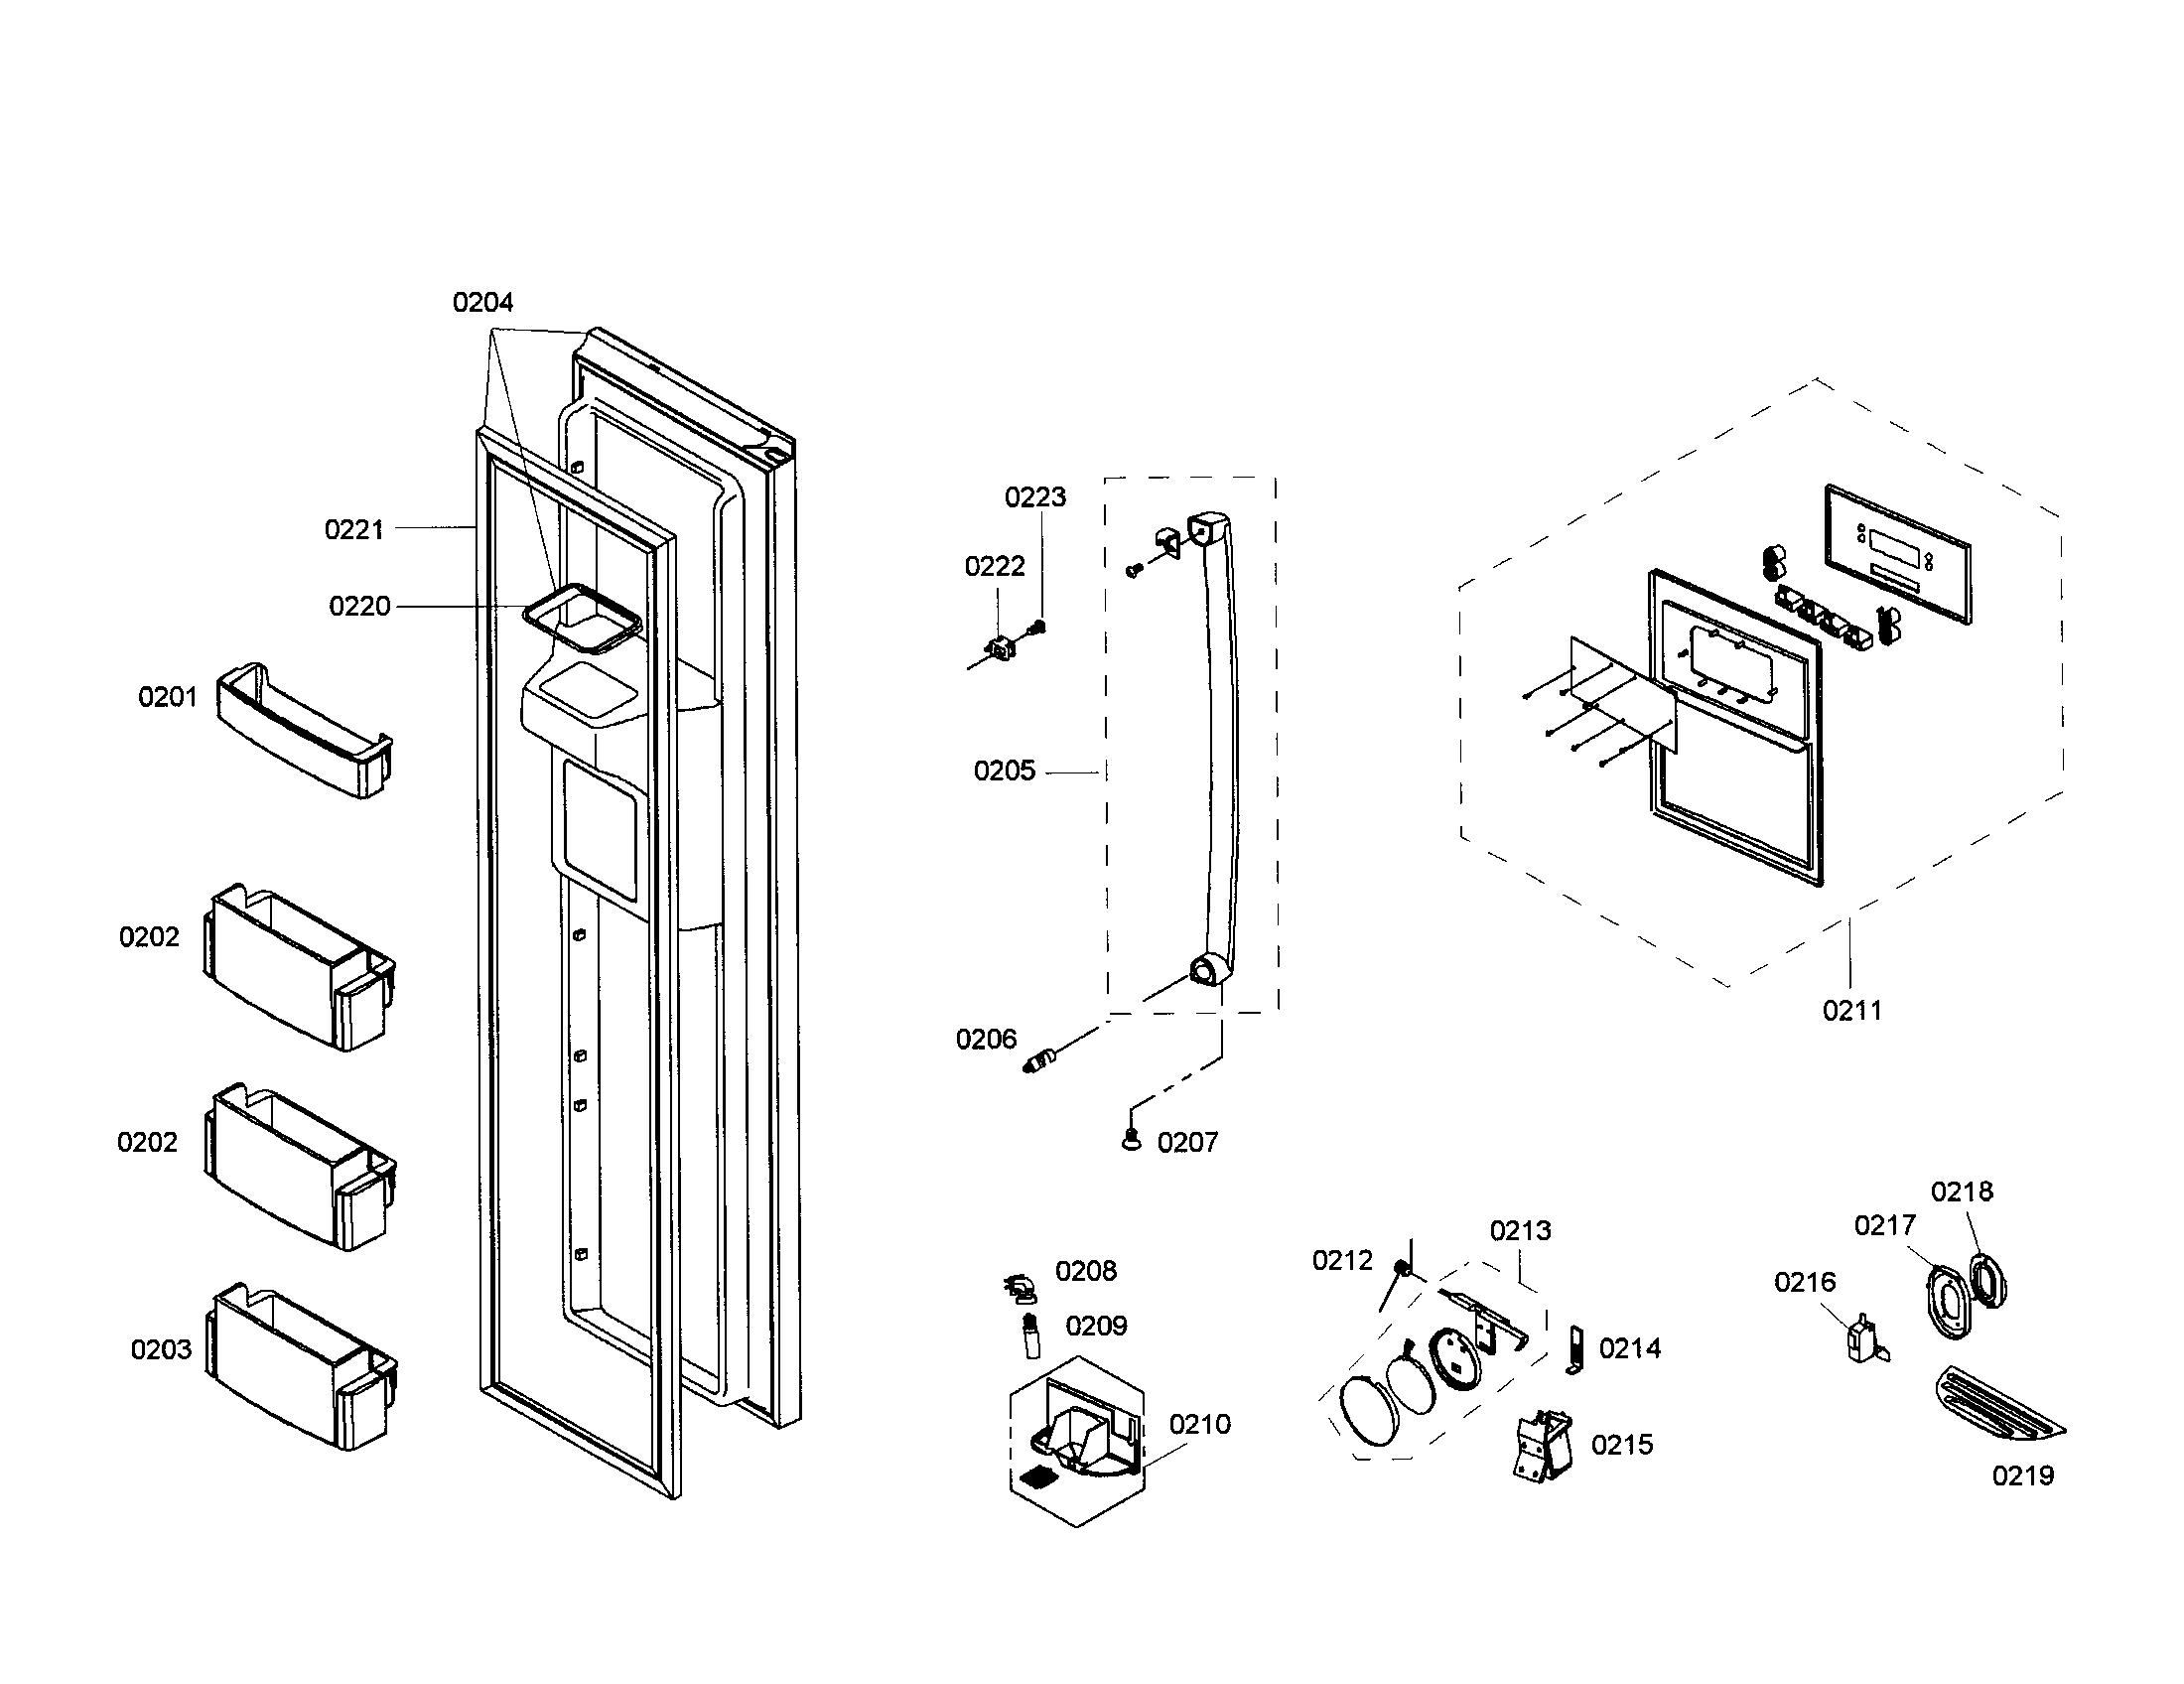 Bosch model B20CS81SNB/02 side-by-side refrigerator